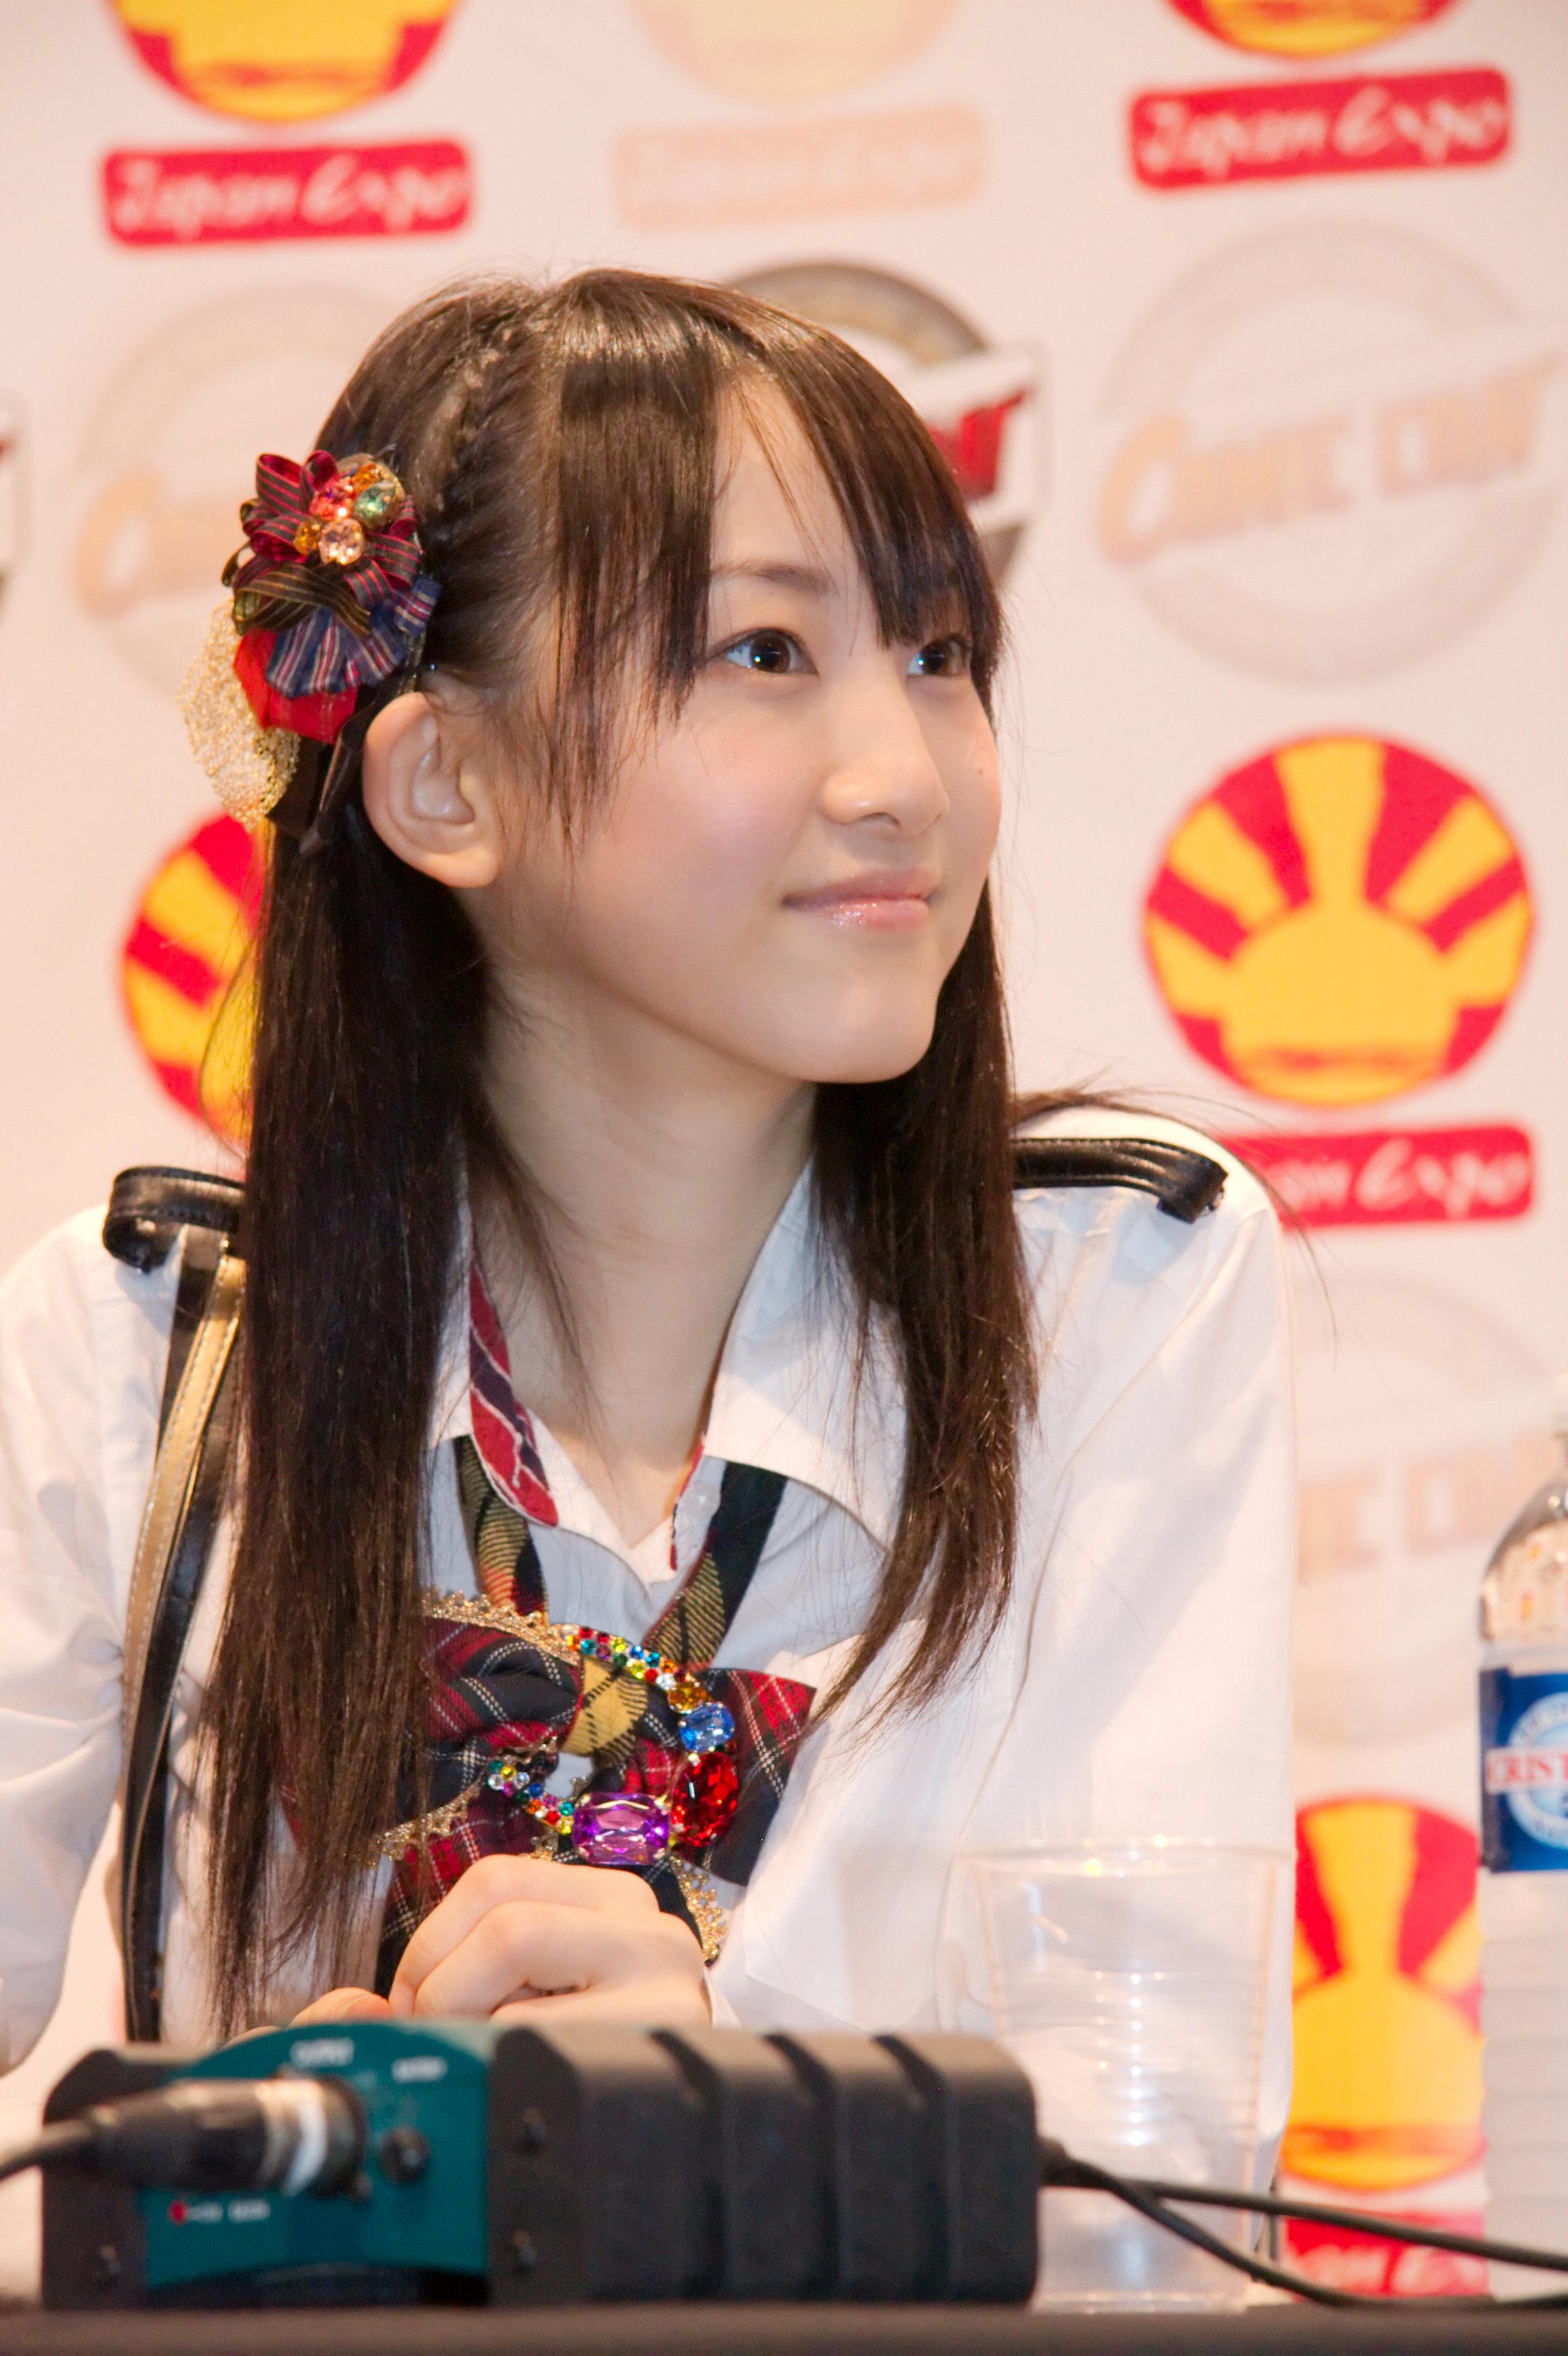 SKE48情報局 松井玲奈の写真、画像(NAVERまとめより)